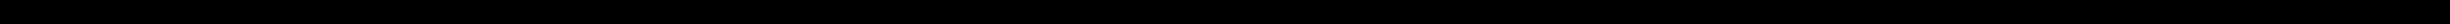 dashBIG-01.png